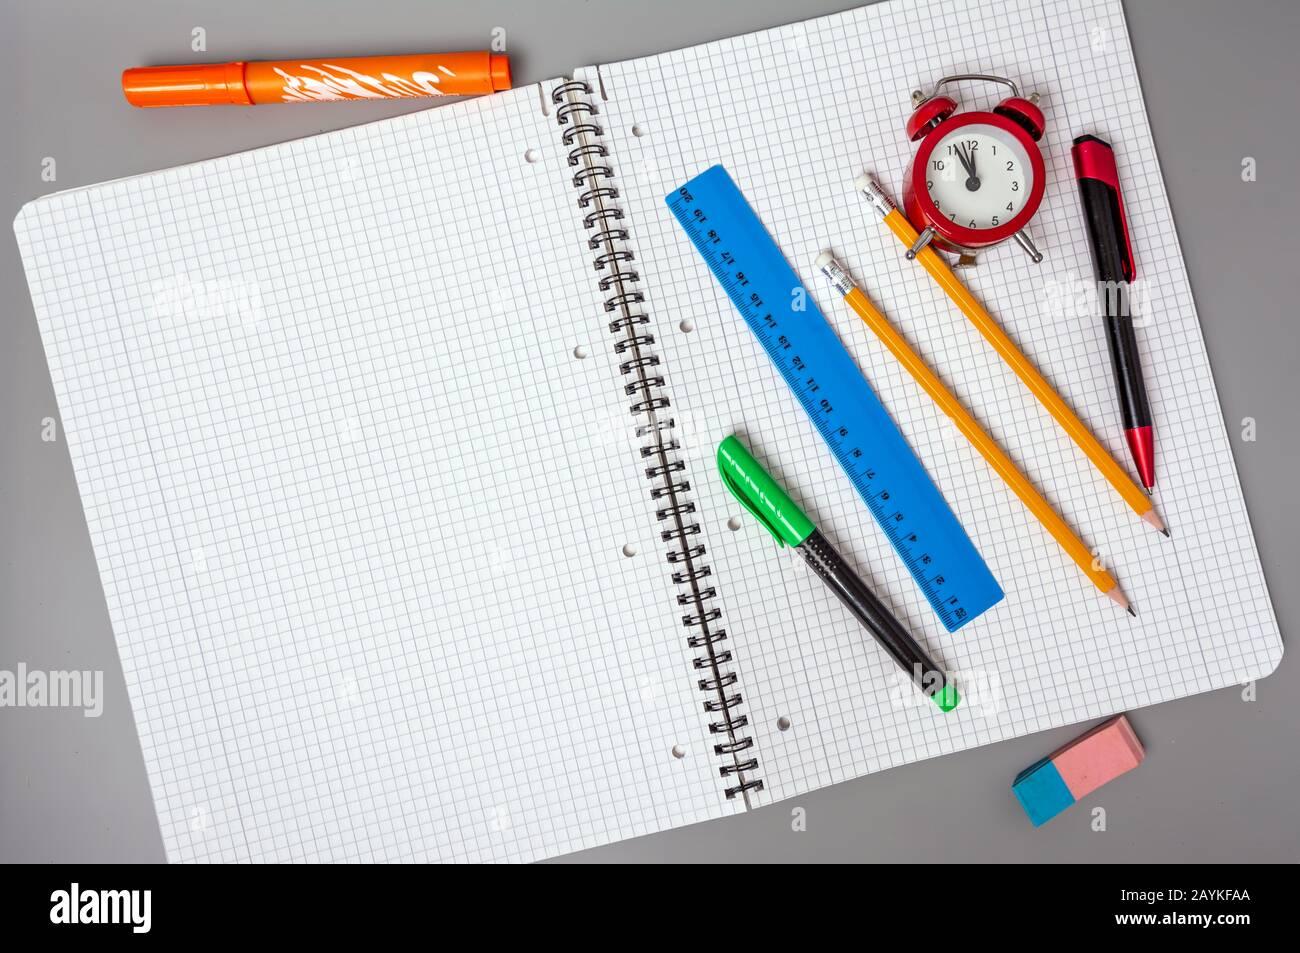 Pencils, a pen and a ruler lie on an open notebook. An alarm clock reminds of time. Office. School supplies. Stock Photo